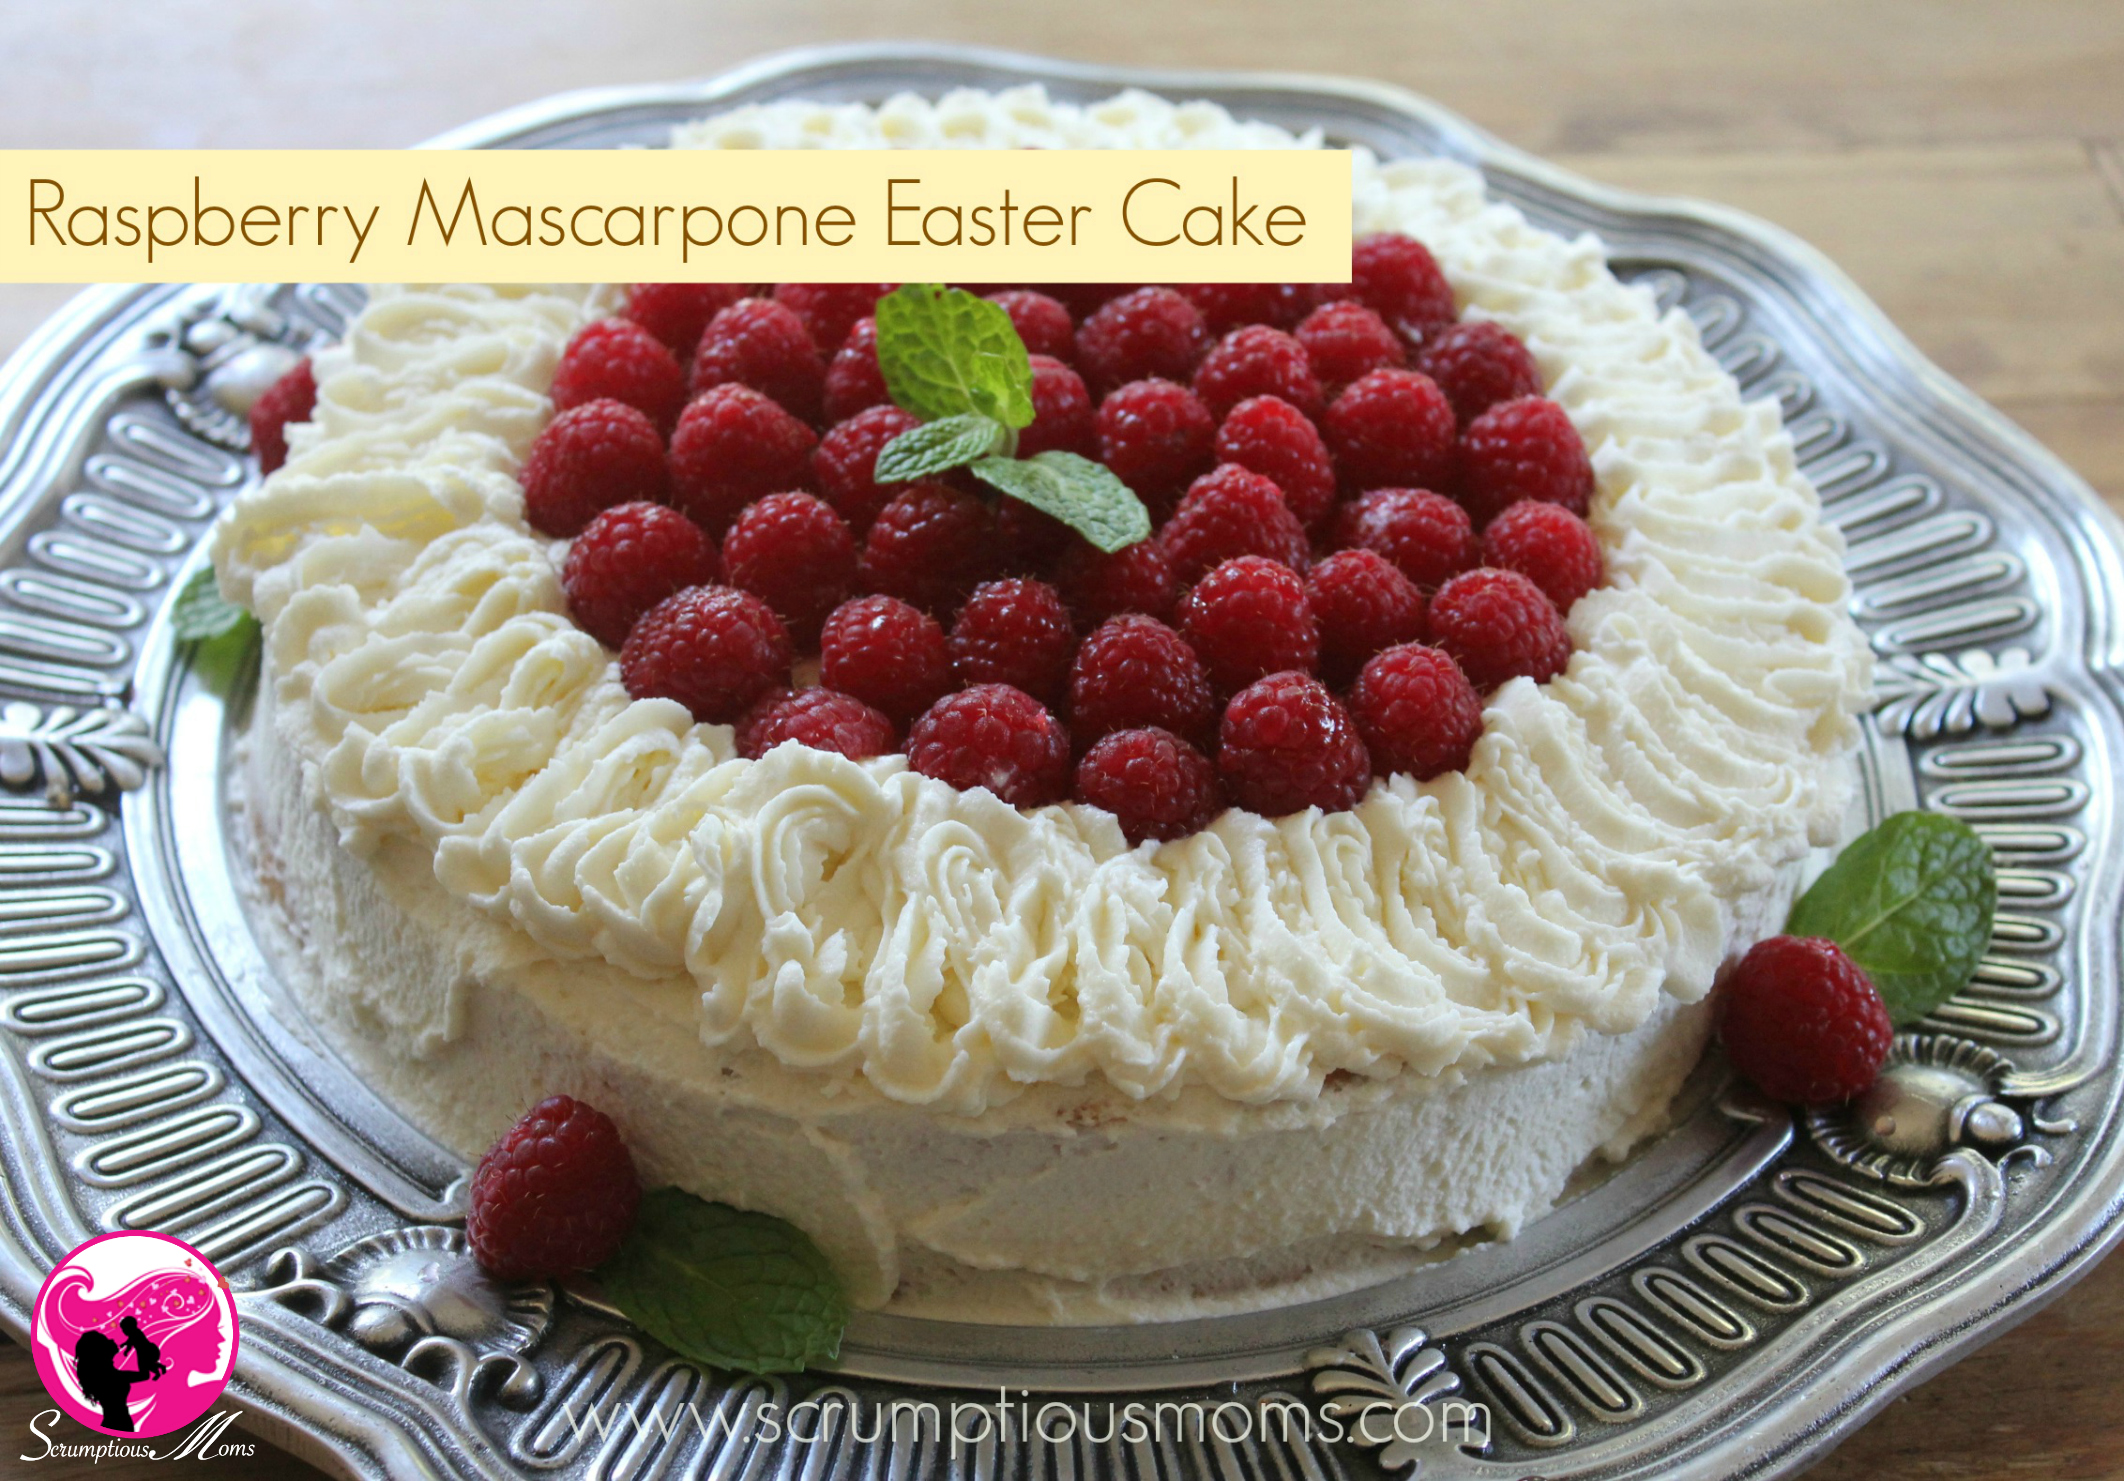 Raspberry Mascarpone Easter Cake title image